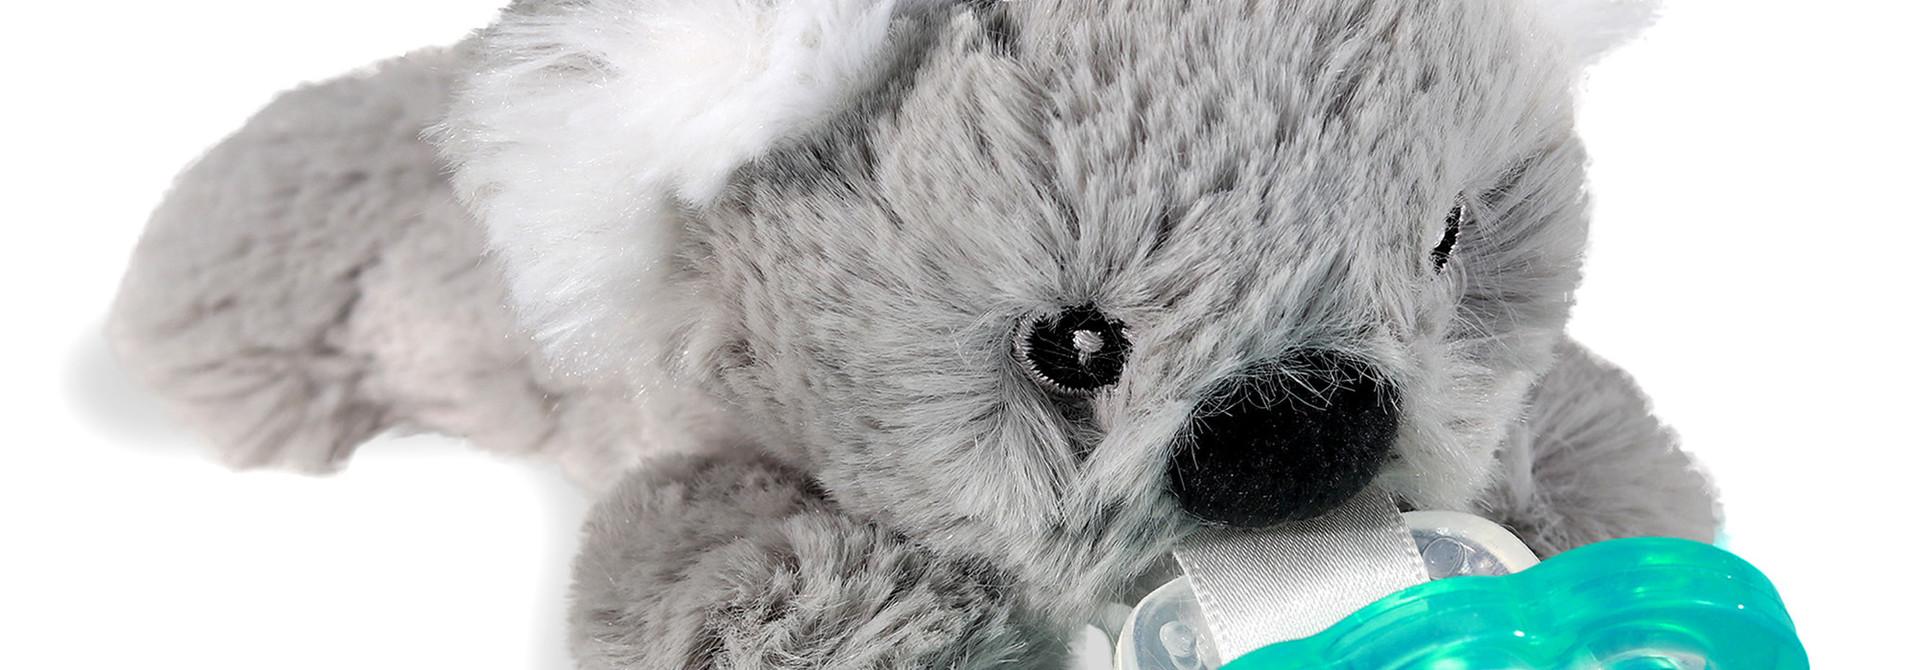 Razbuddy - Kiki le Koala